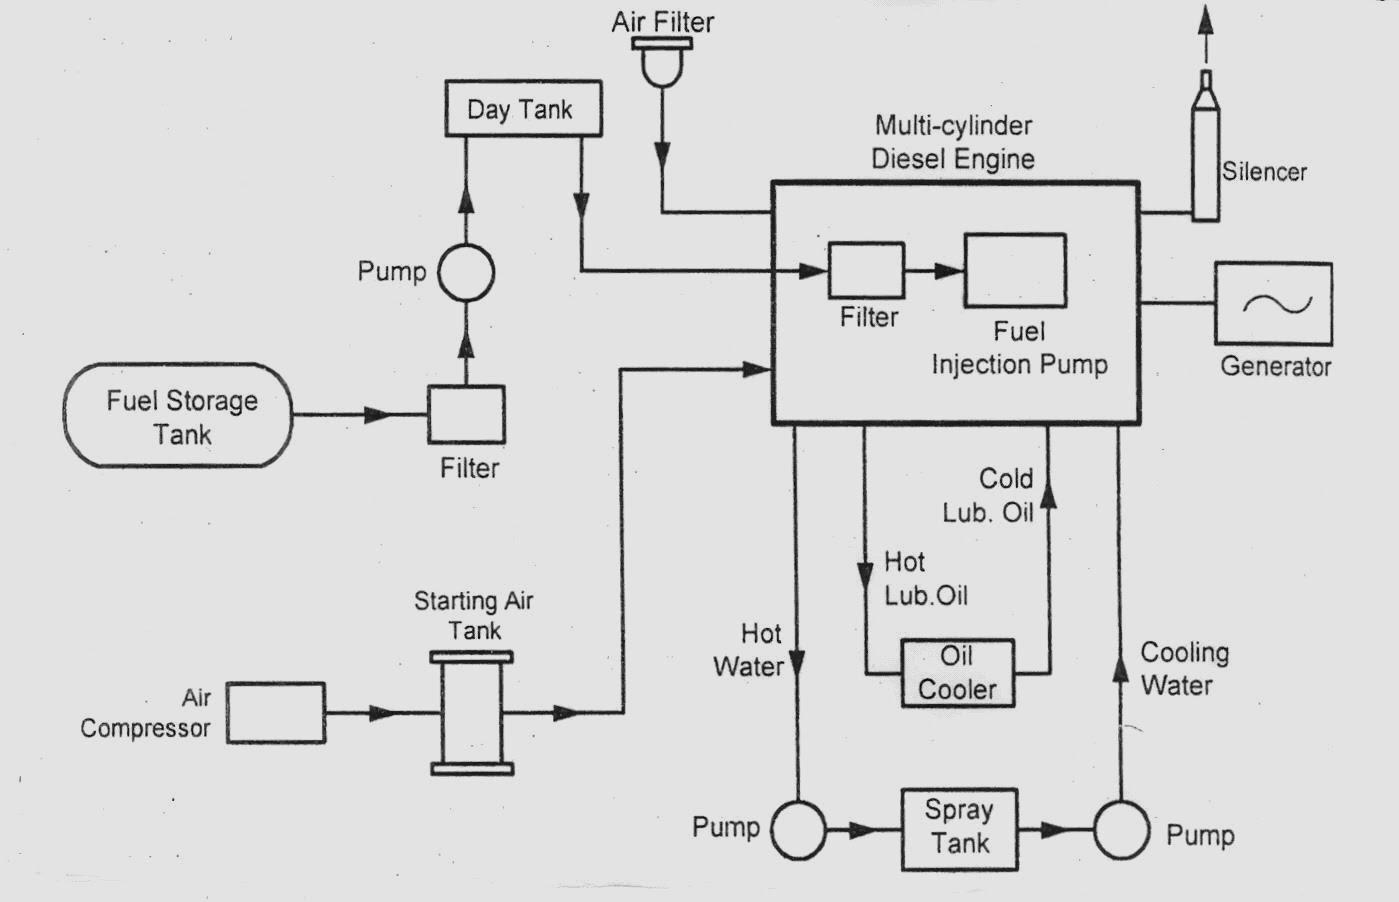 hydro power plant diagram nuclear energy plant diagram